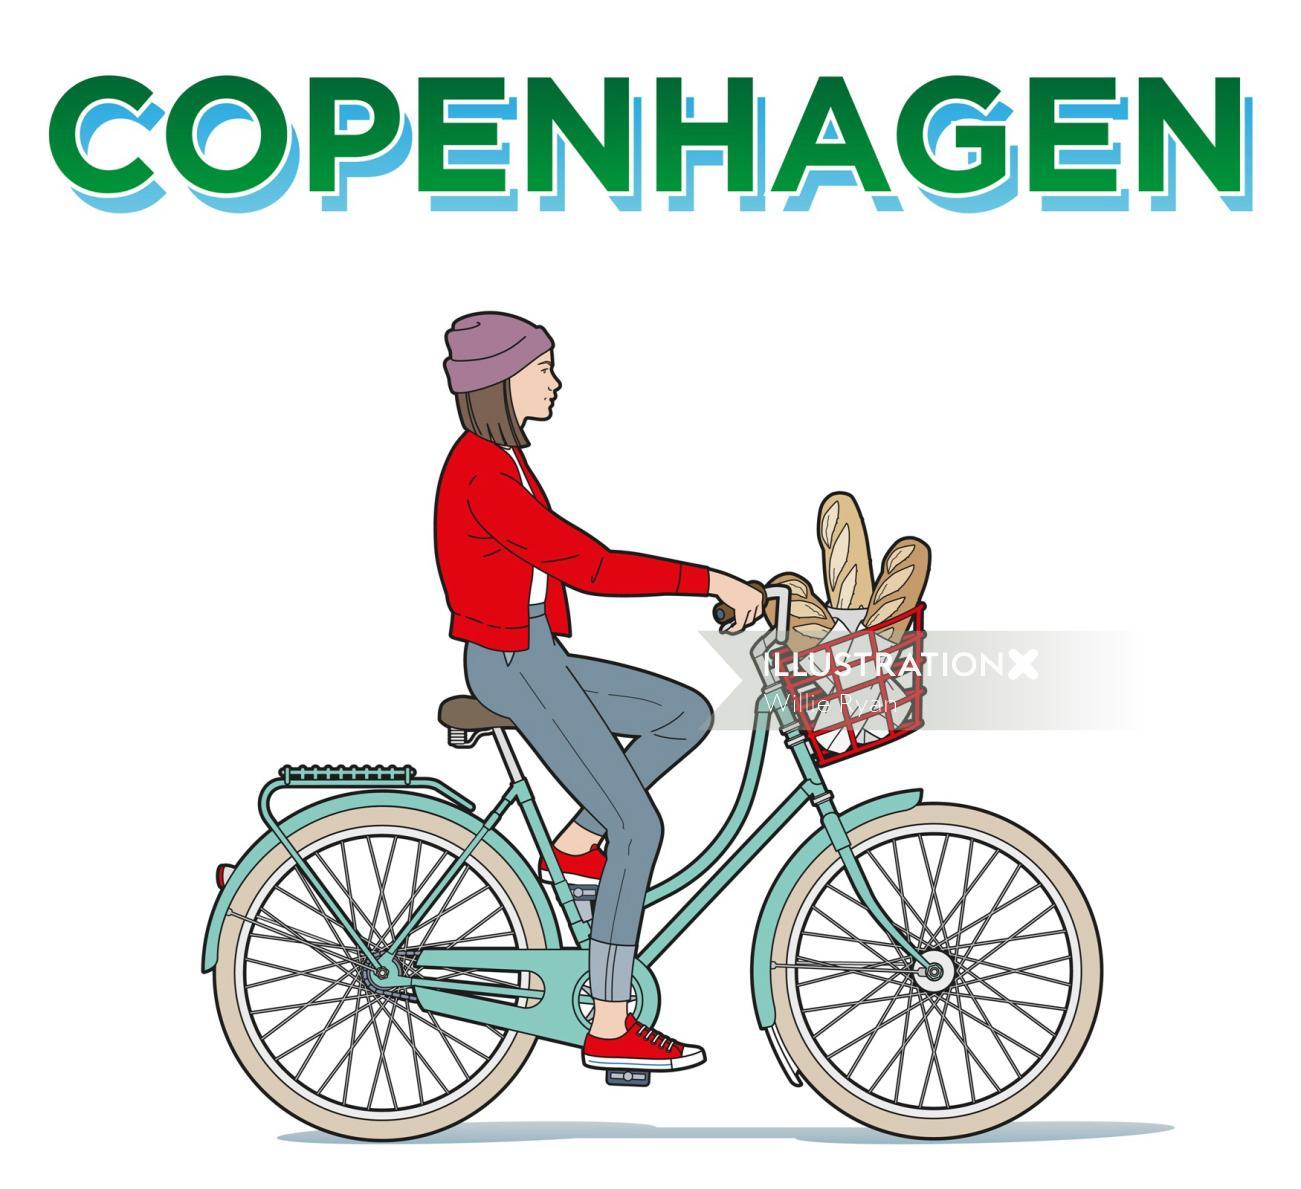 Copenhagen, Denmark, Danish, bicycle, bike, cycle, cycling, student, girl, lifestyle